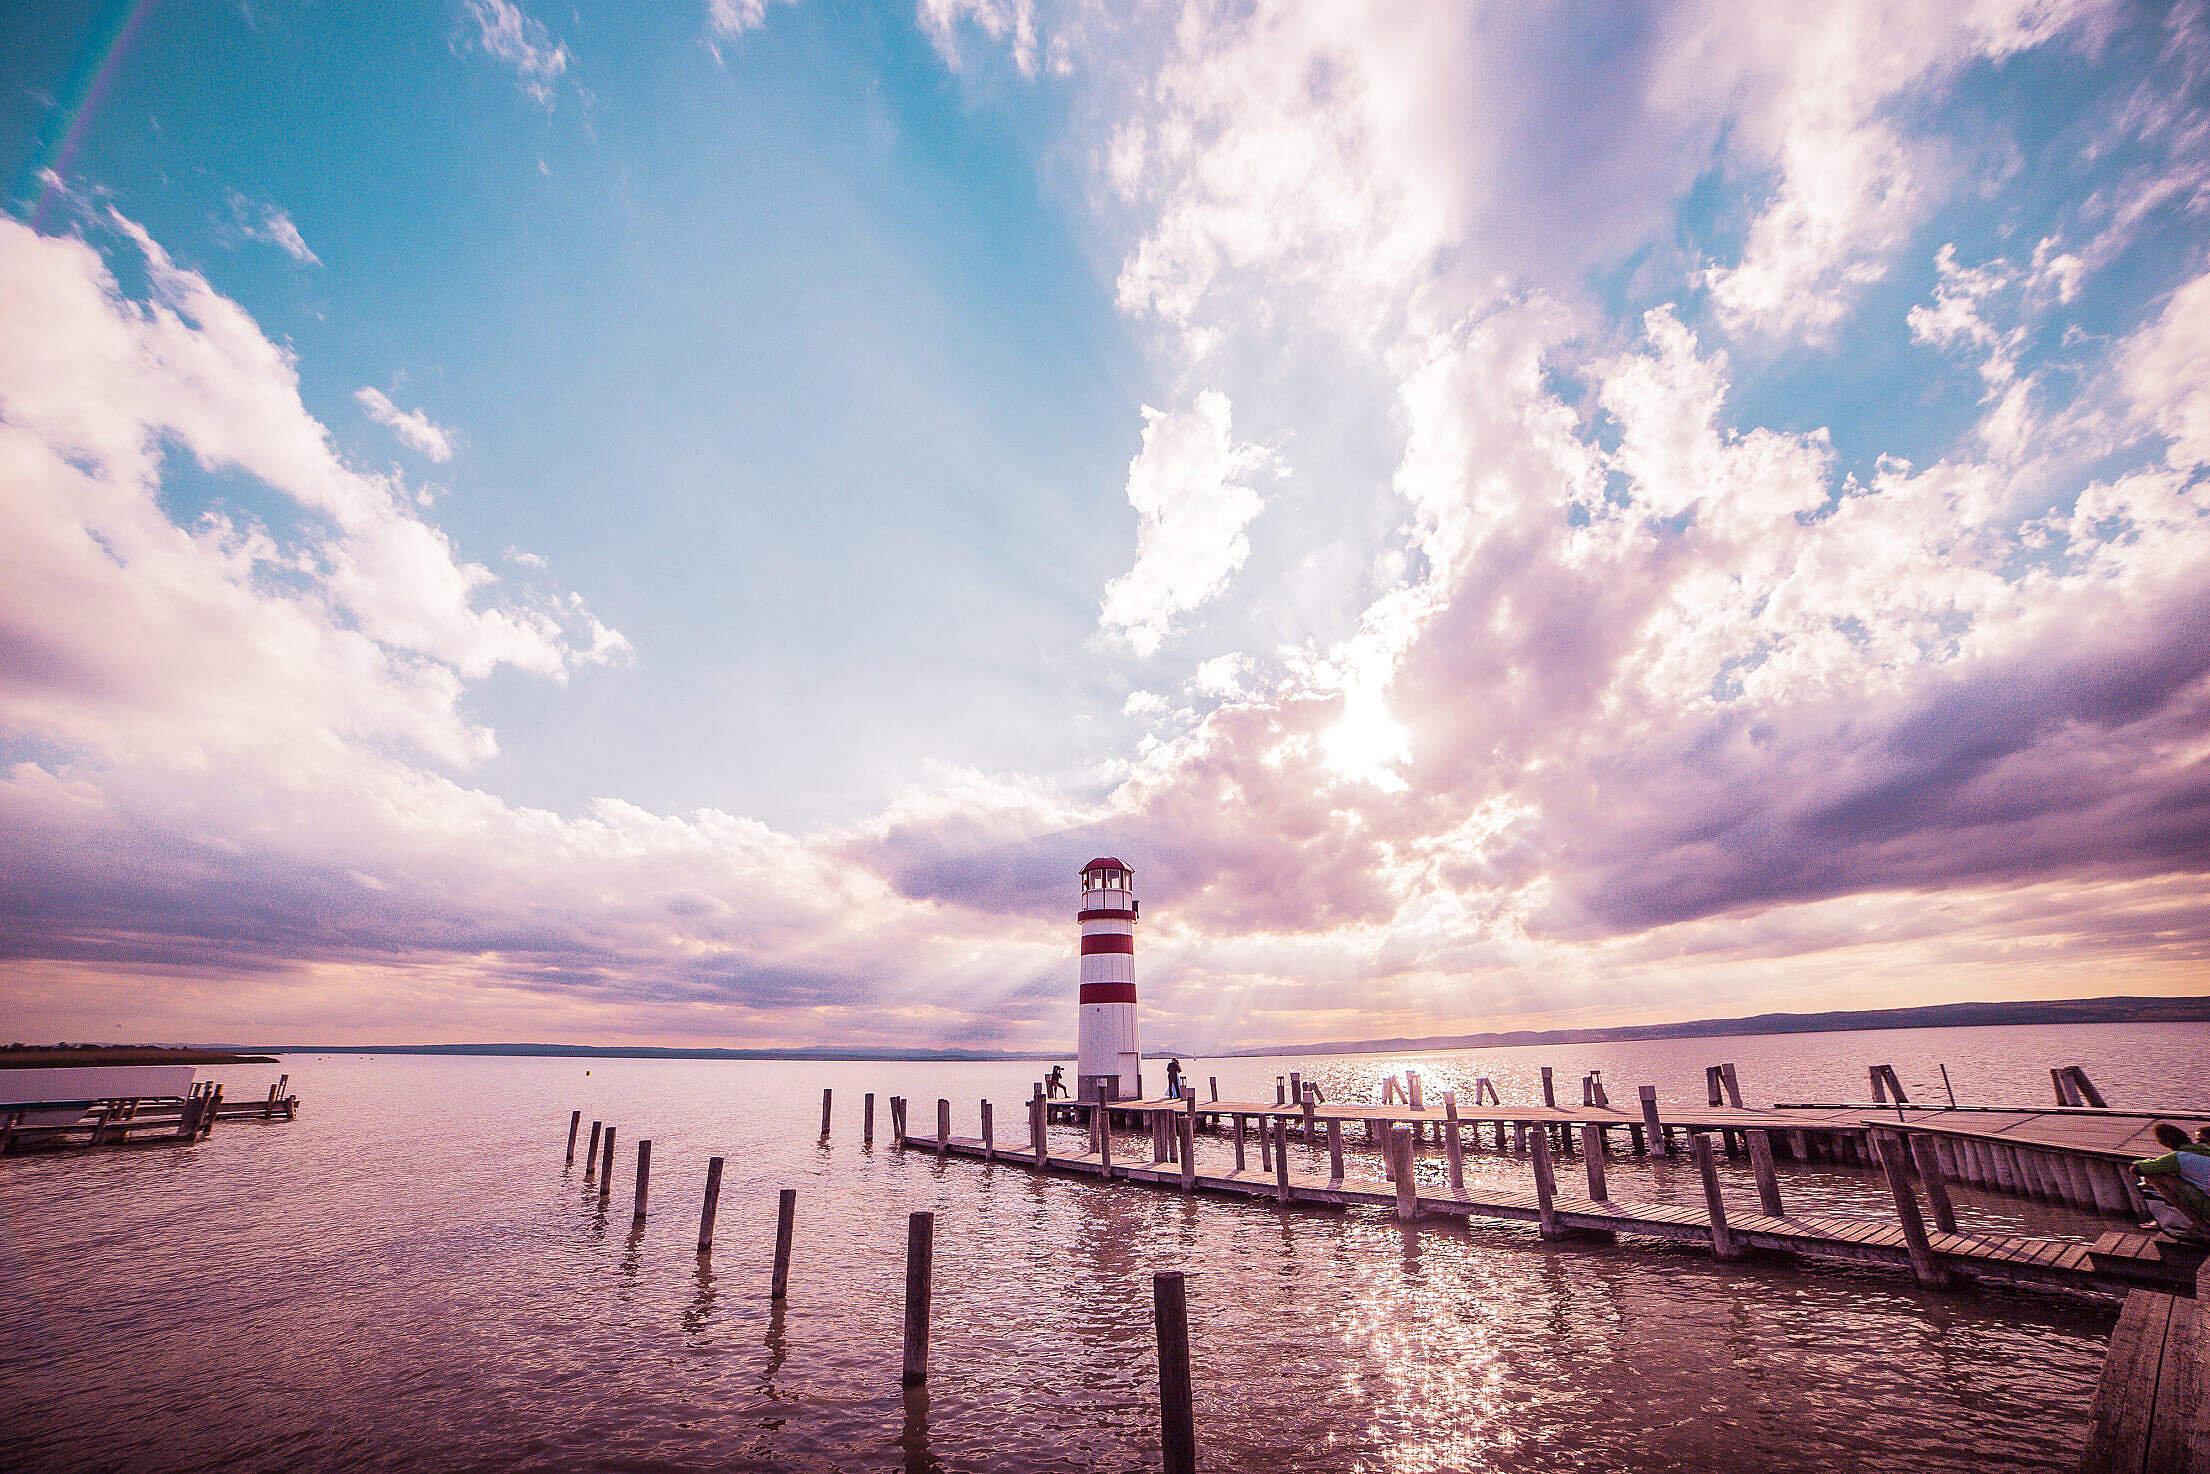 lighthouse-and-sunset-colorful-edit_free_stock_photos_picjumbo_HNCK5384-2210x1474[1].jpg